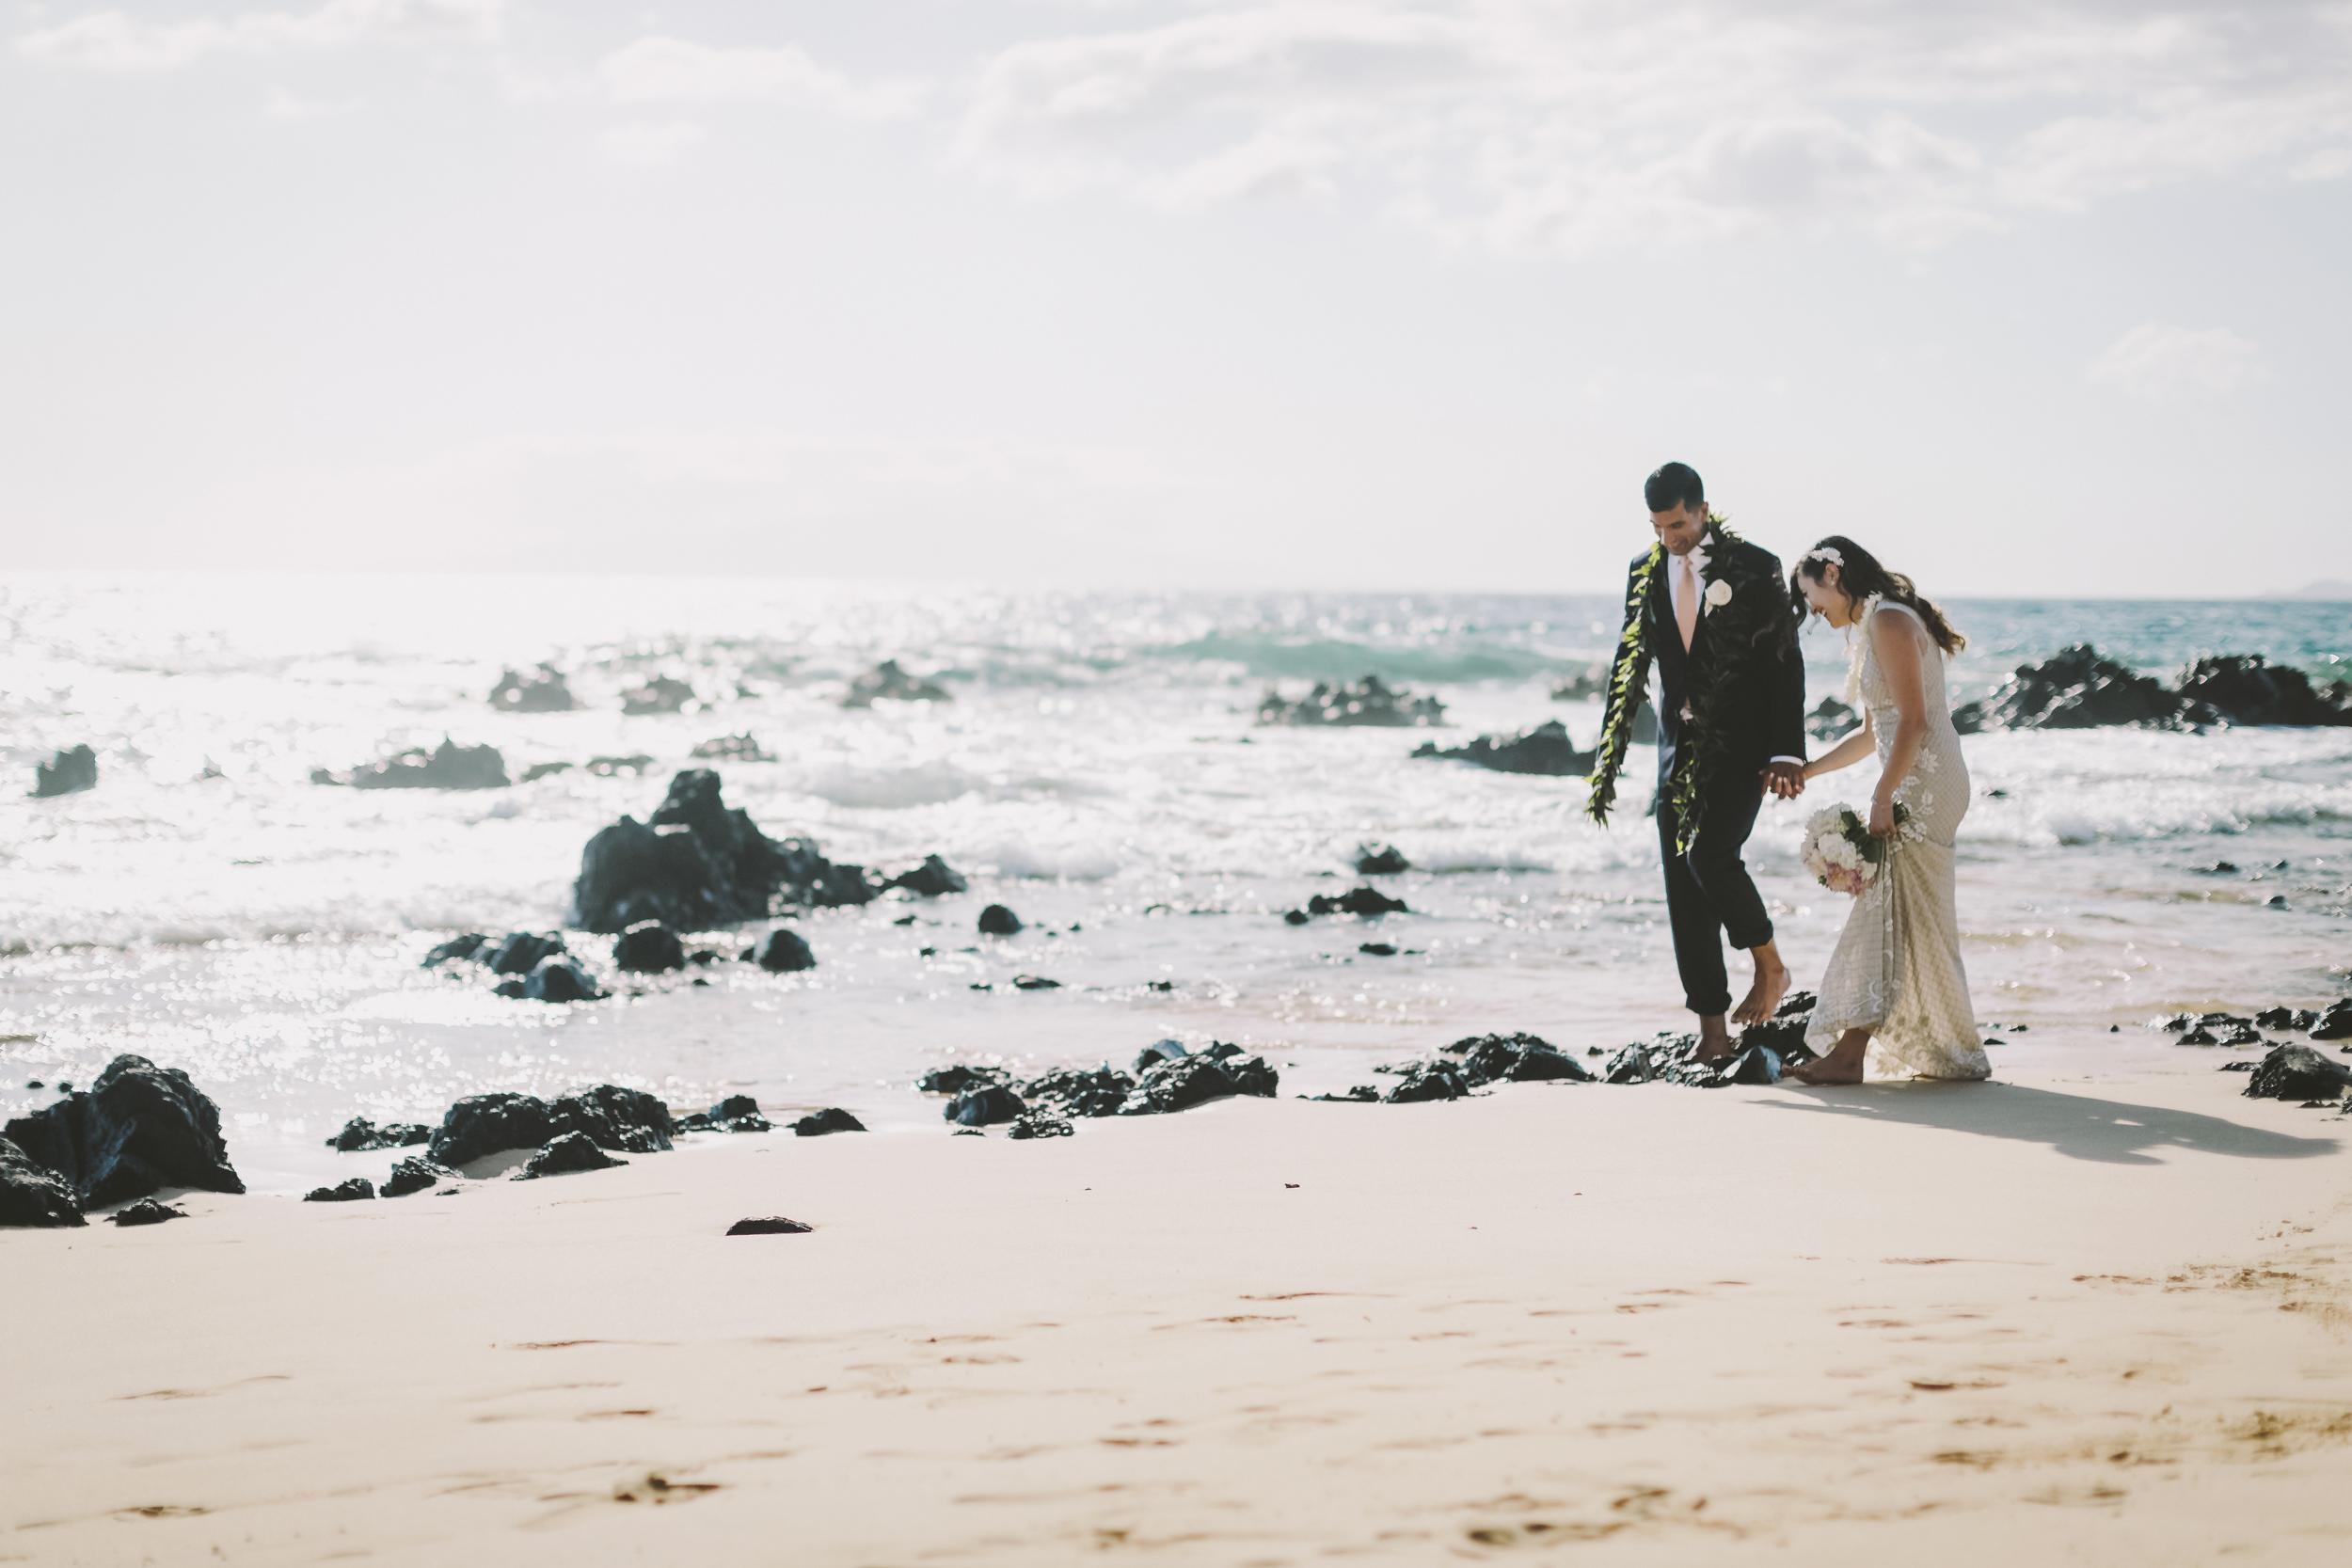 angie-diaz-photography-mokapu-beach-maui-elopement-40.jpg